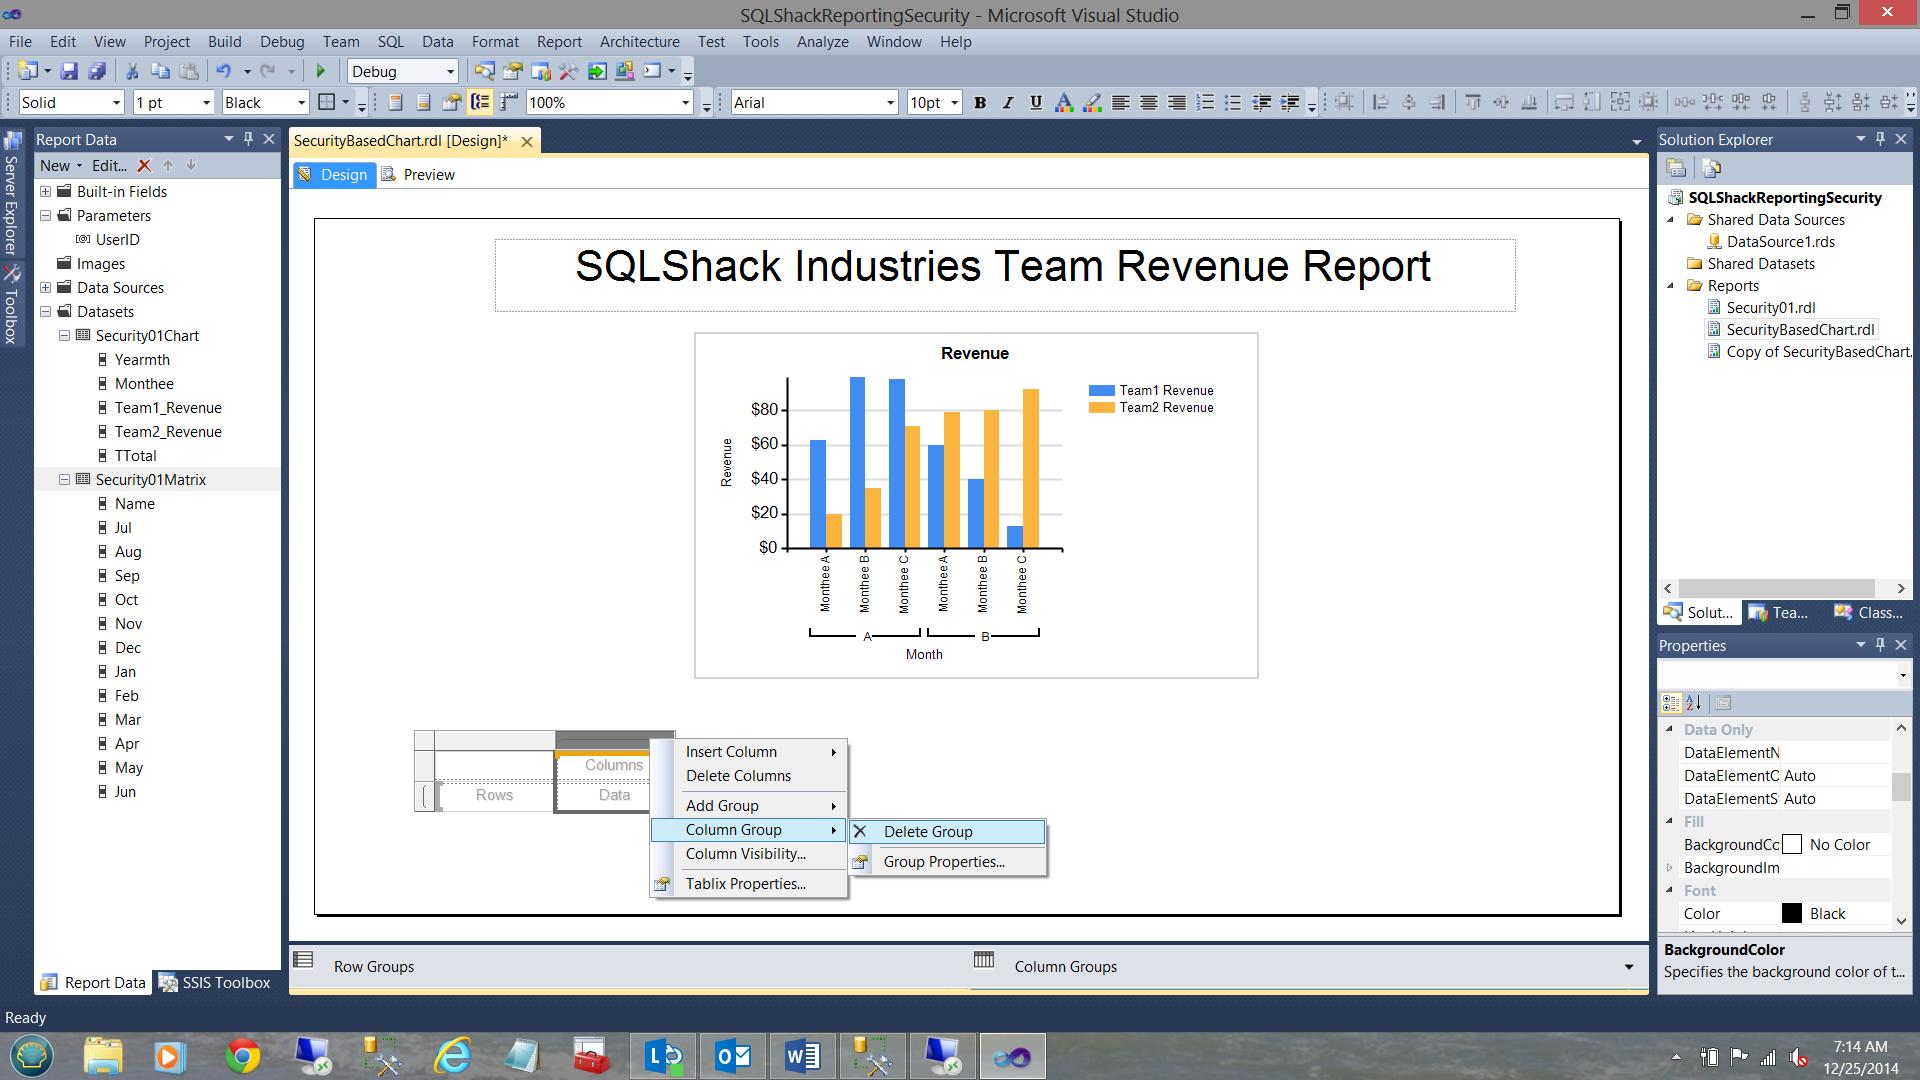 SQL Server安全机制–如何控制用户能够在报告中查看哪些数据37